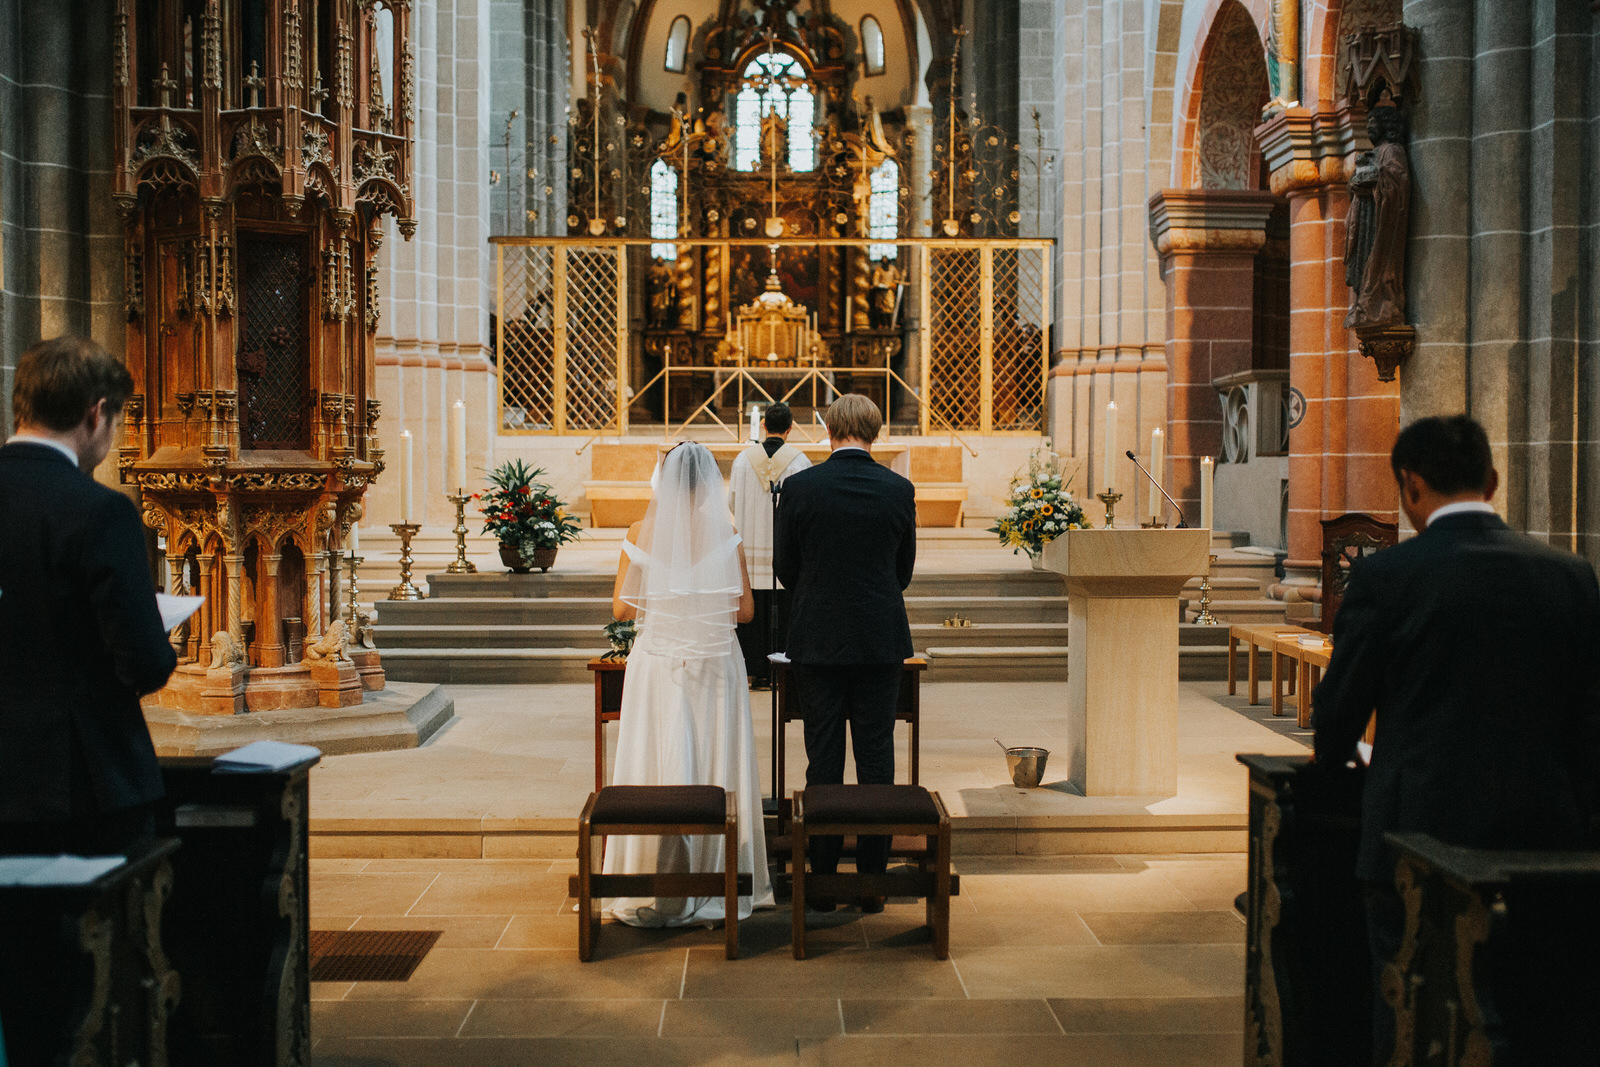 Kirchliche Trauung Ohne Firmung